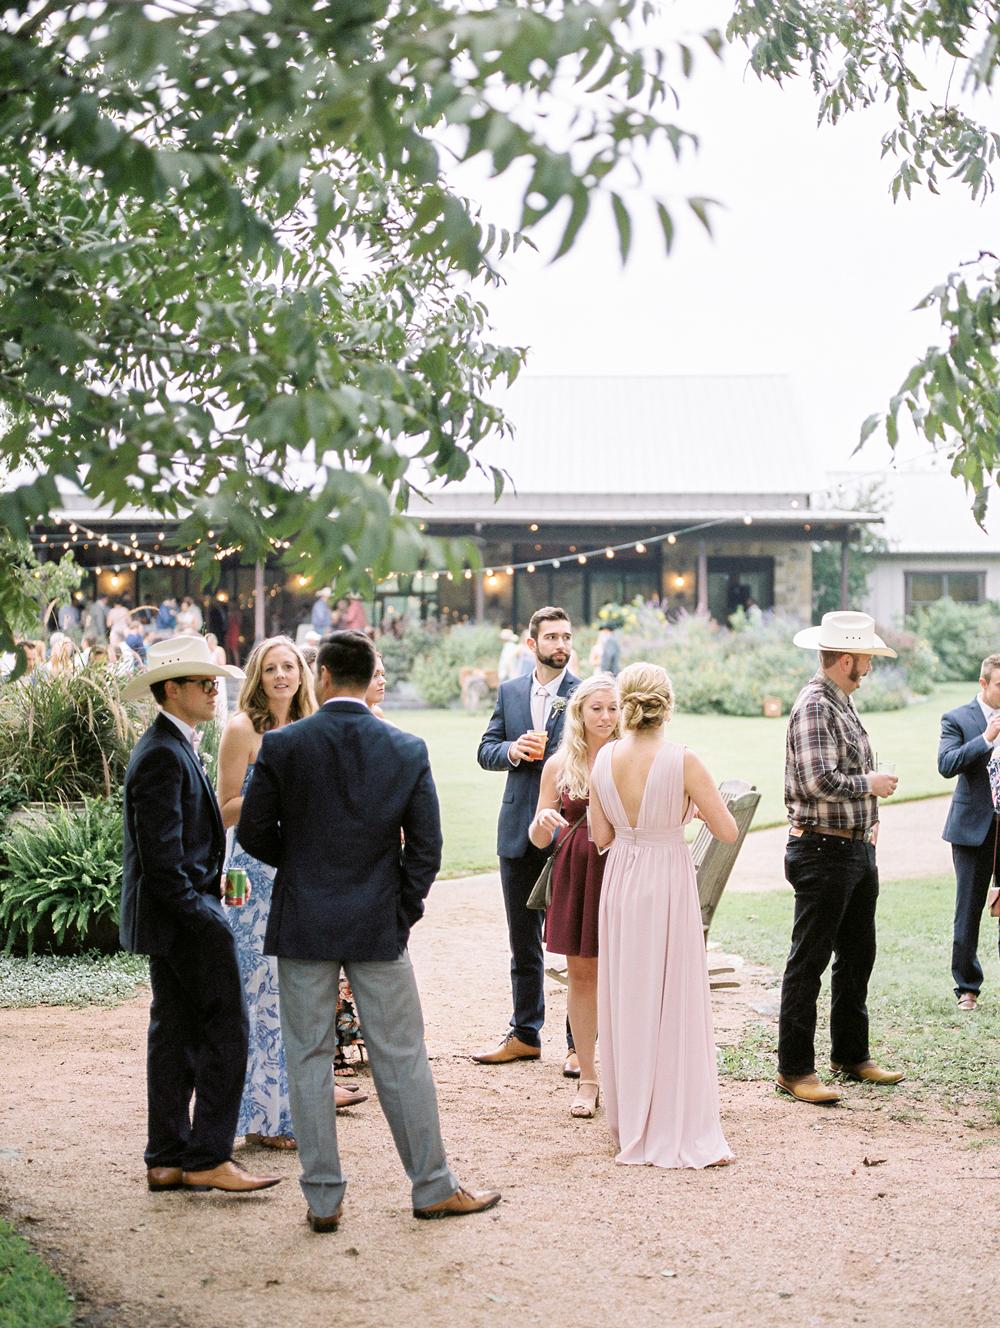 guests wearing spring wedding attire